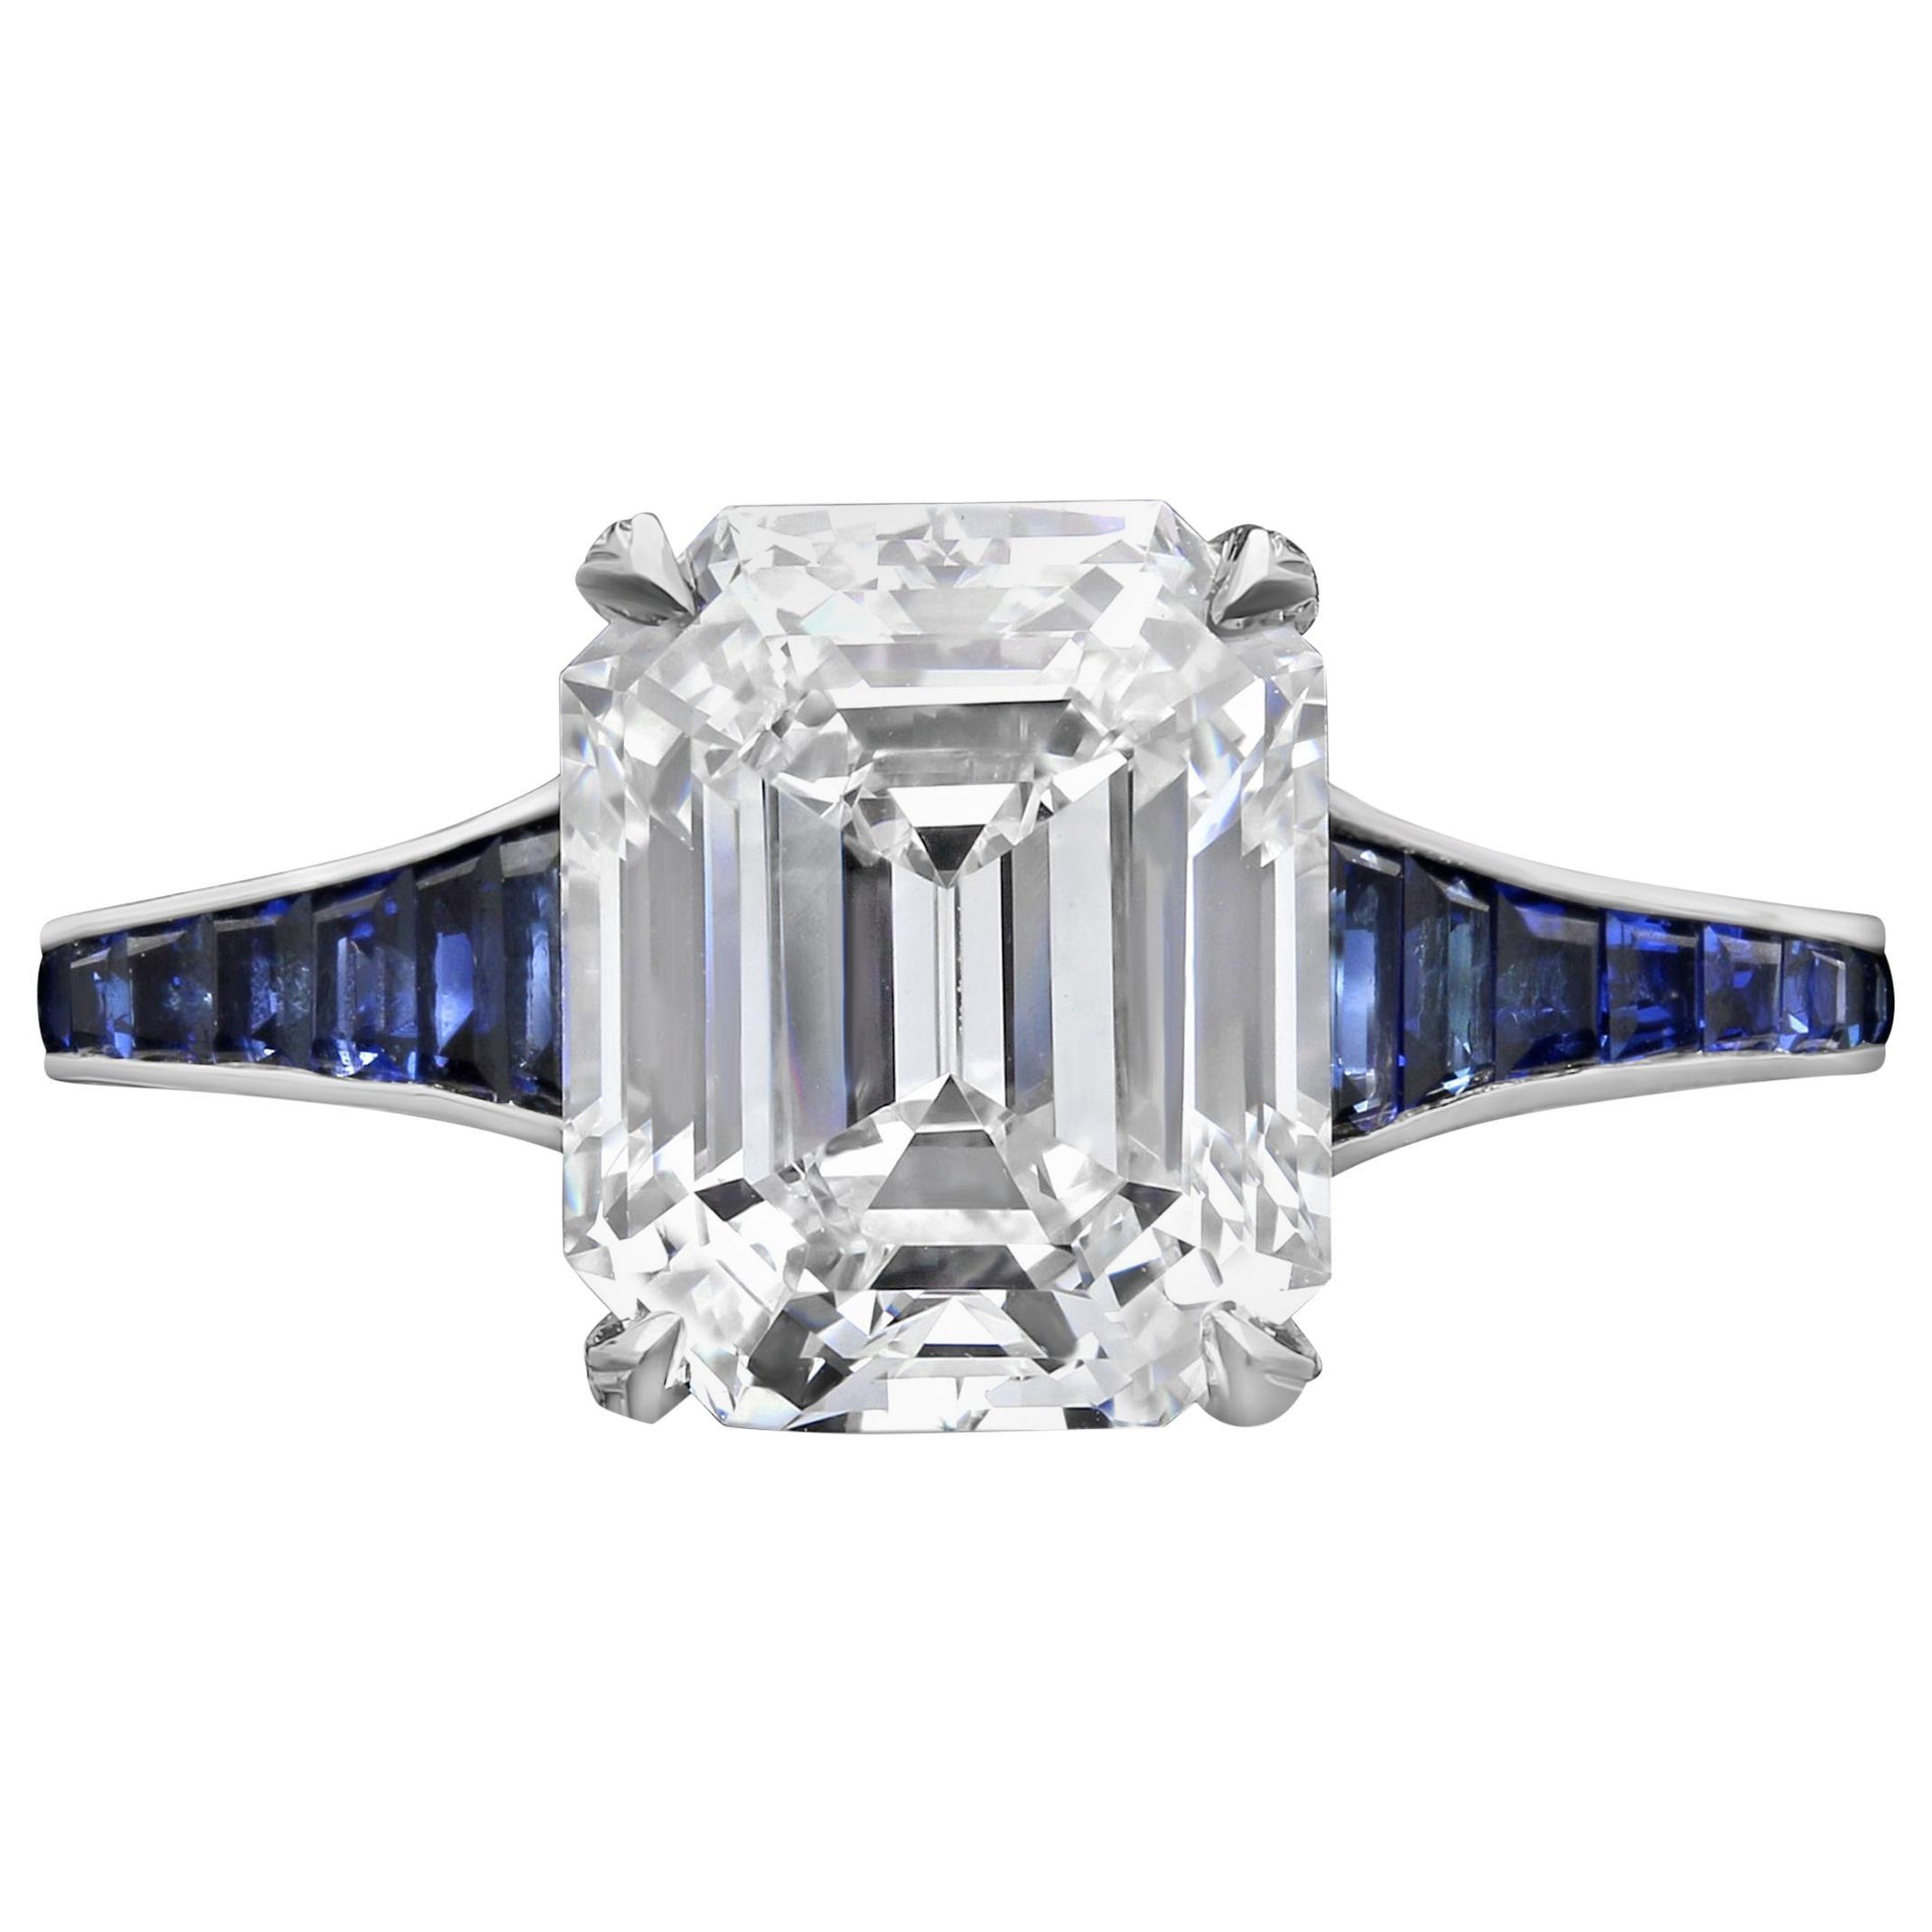 3.20 Carat H VVS1 Vintage Emerald Cut Diamond Ring and Sapphire Band by Hancocks